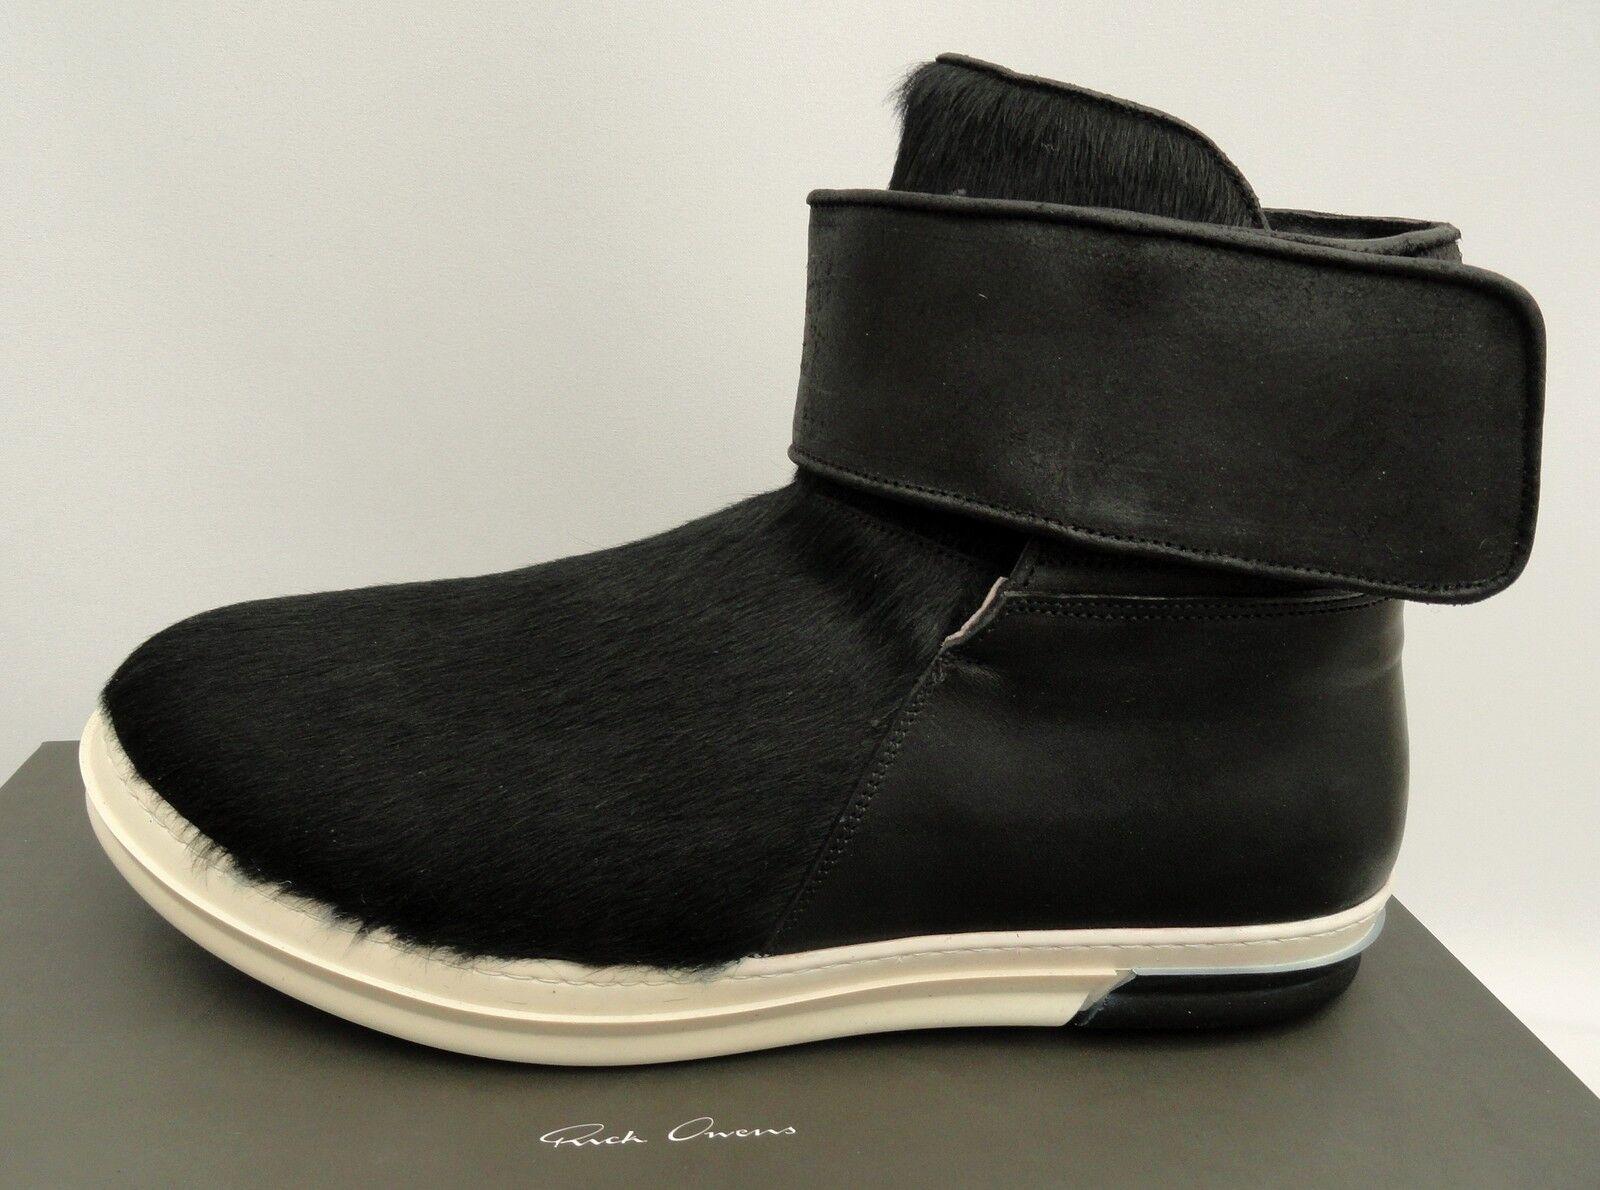 RICK OWENS Black Fur Boots Sneakers UK10 EU44 US11 Trainers New